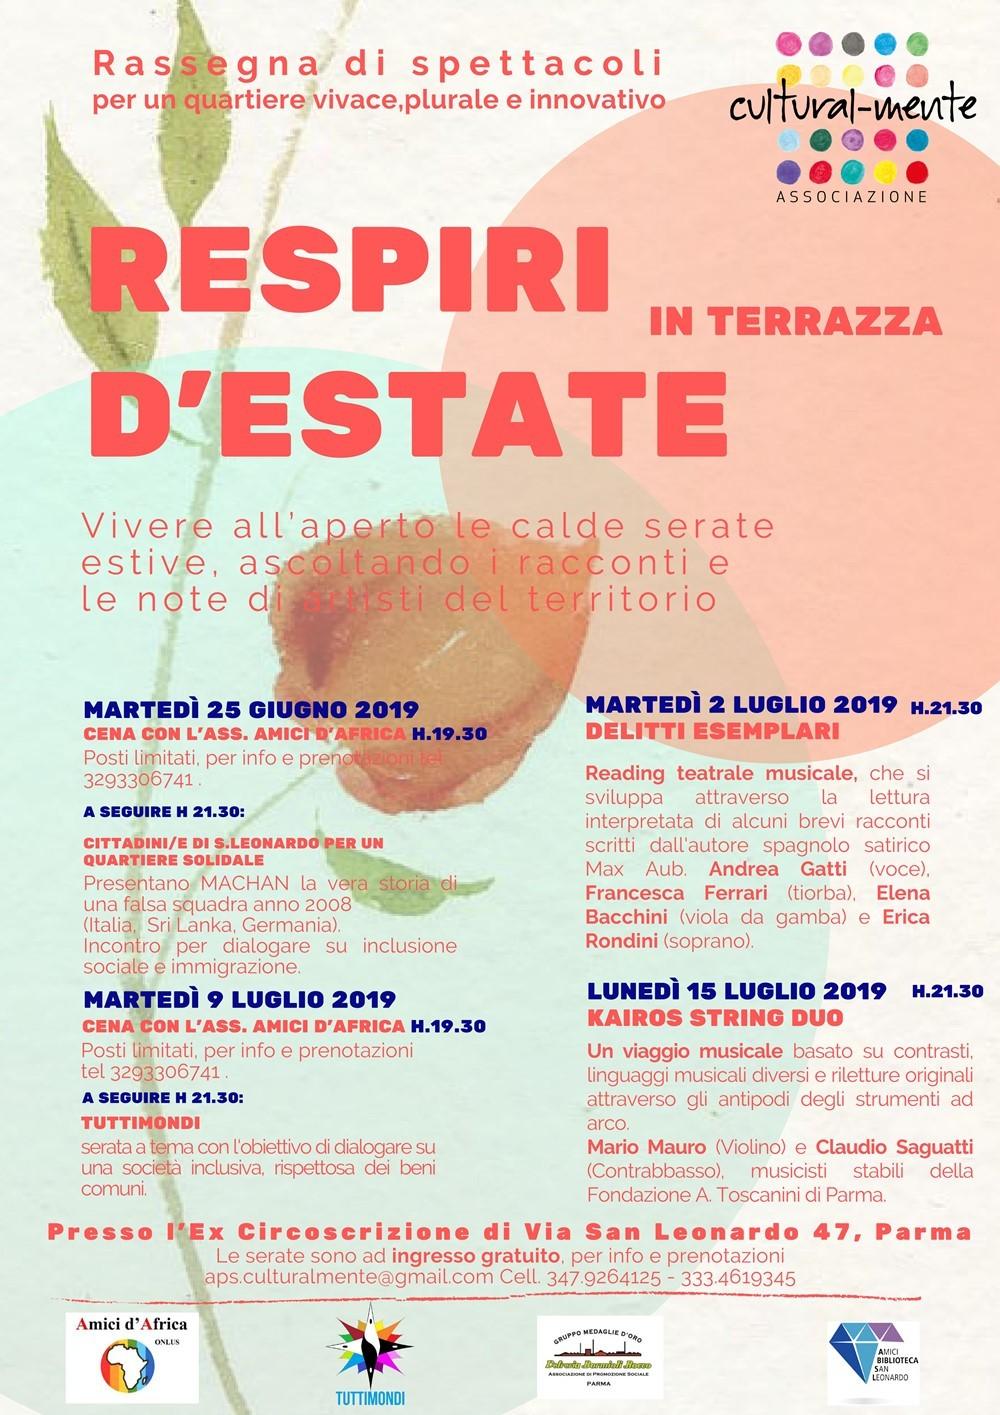 Respiri d'estate, rassegna di spettacoli a San Leonardo